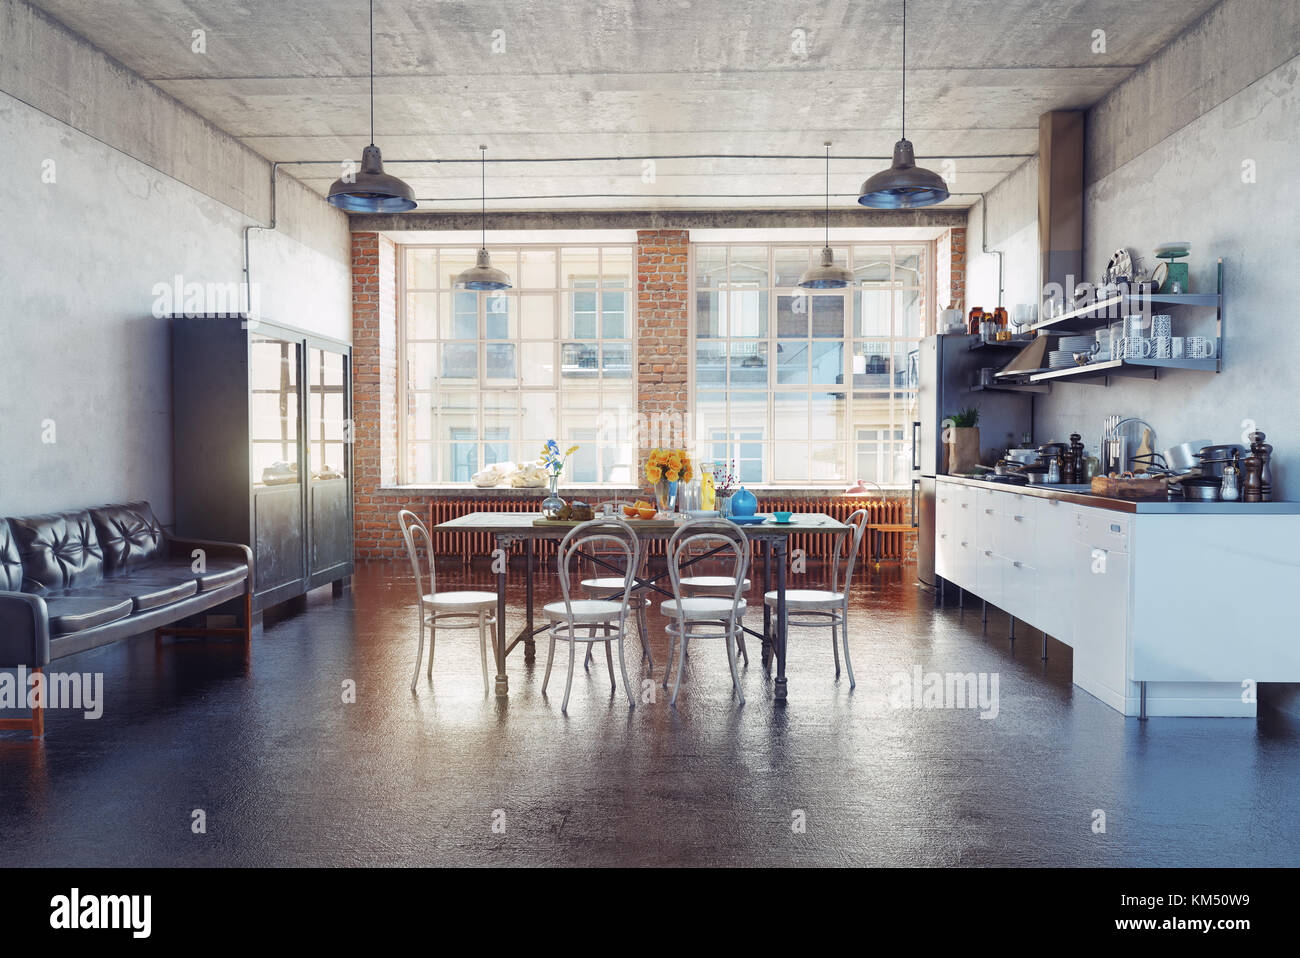 Das moderne Loft kirchen Interieur. 3D-Konzept Stockfoto, Bild ...